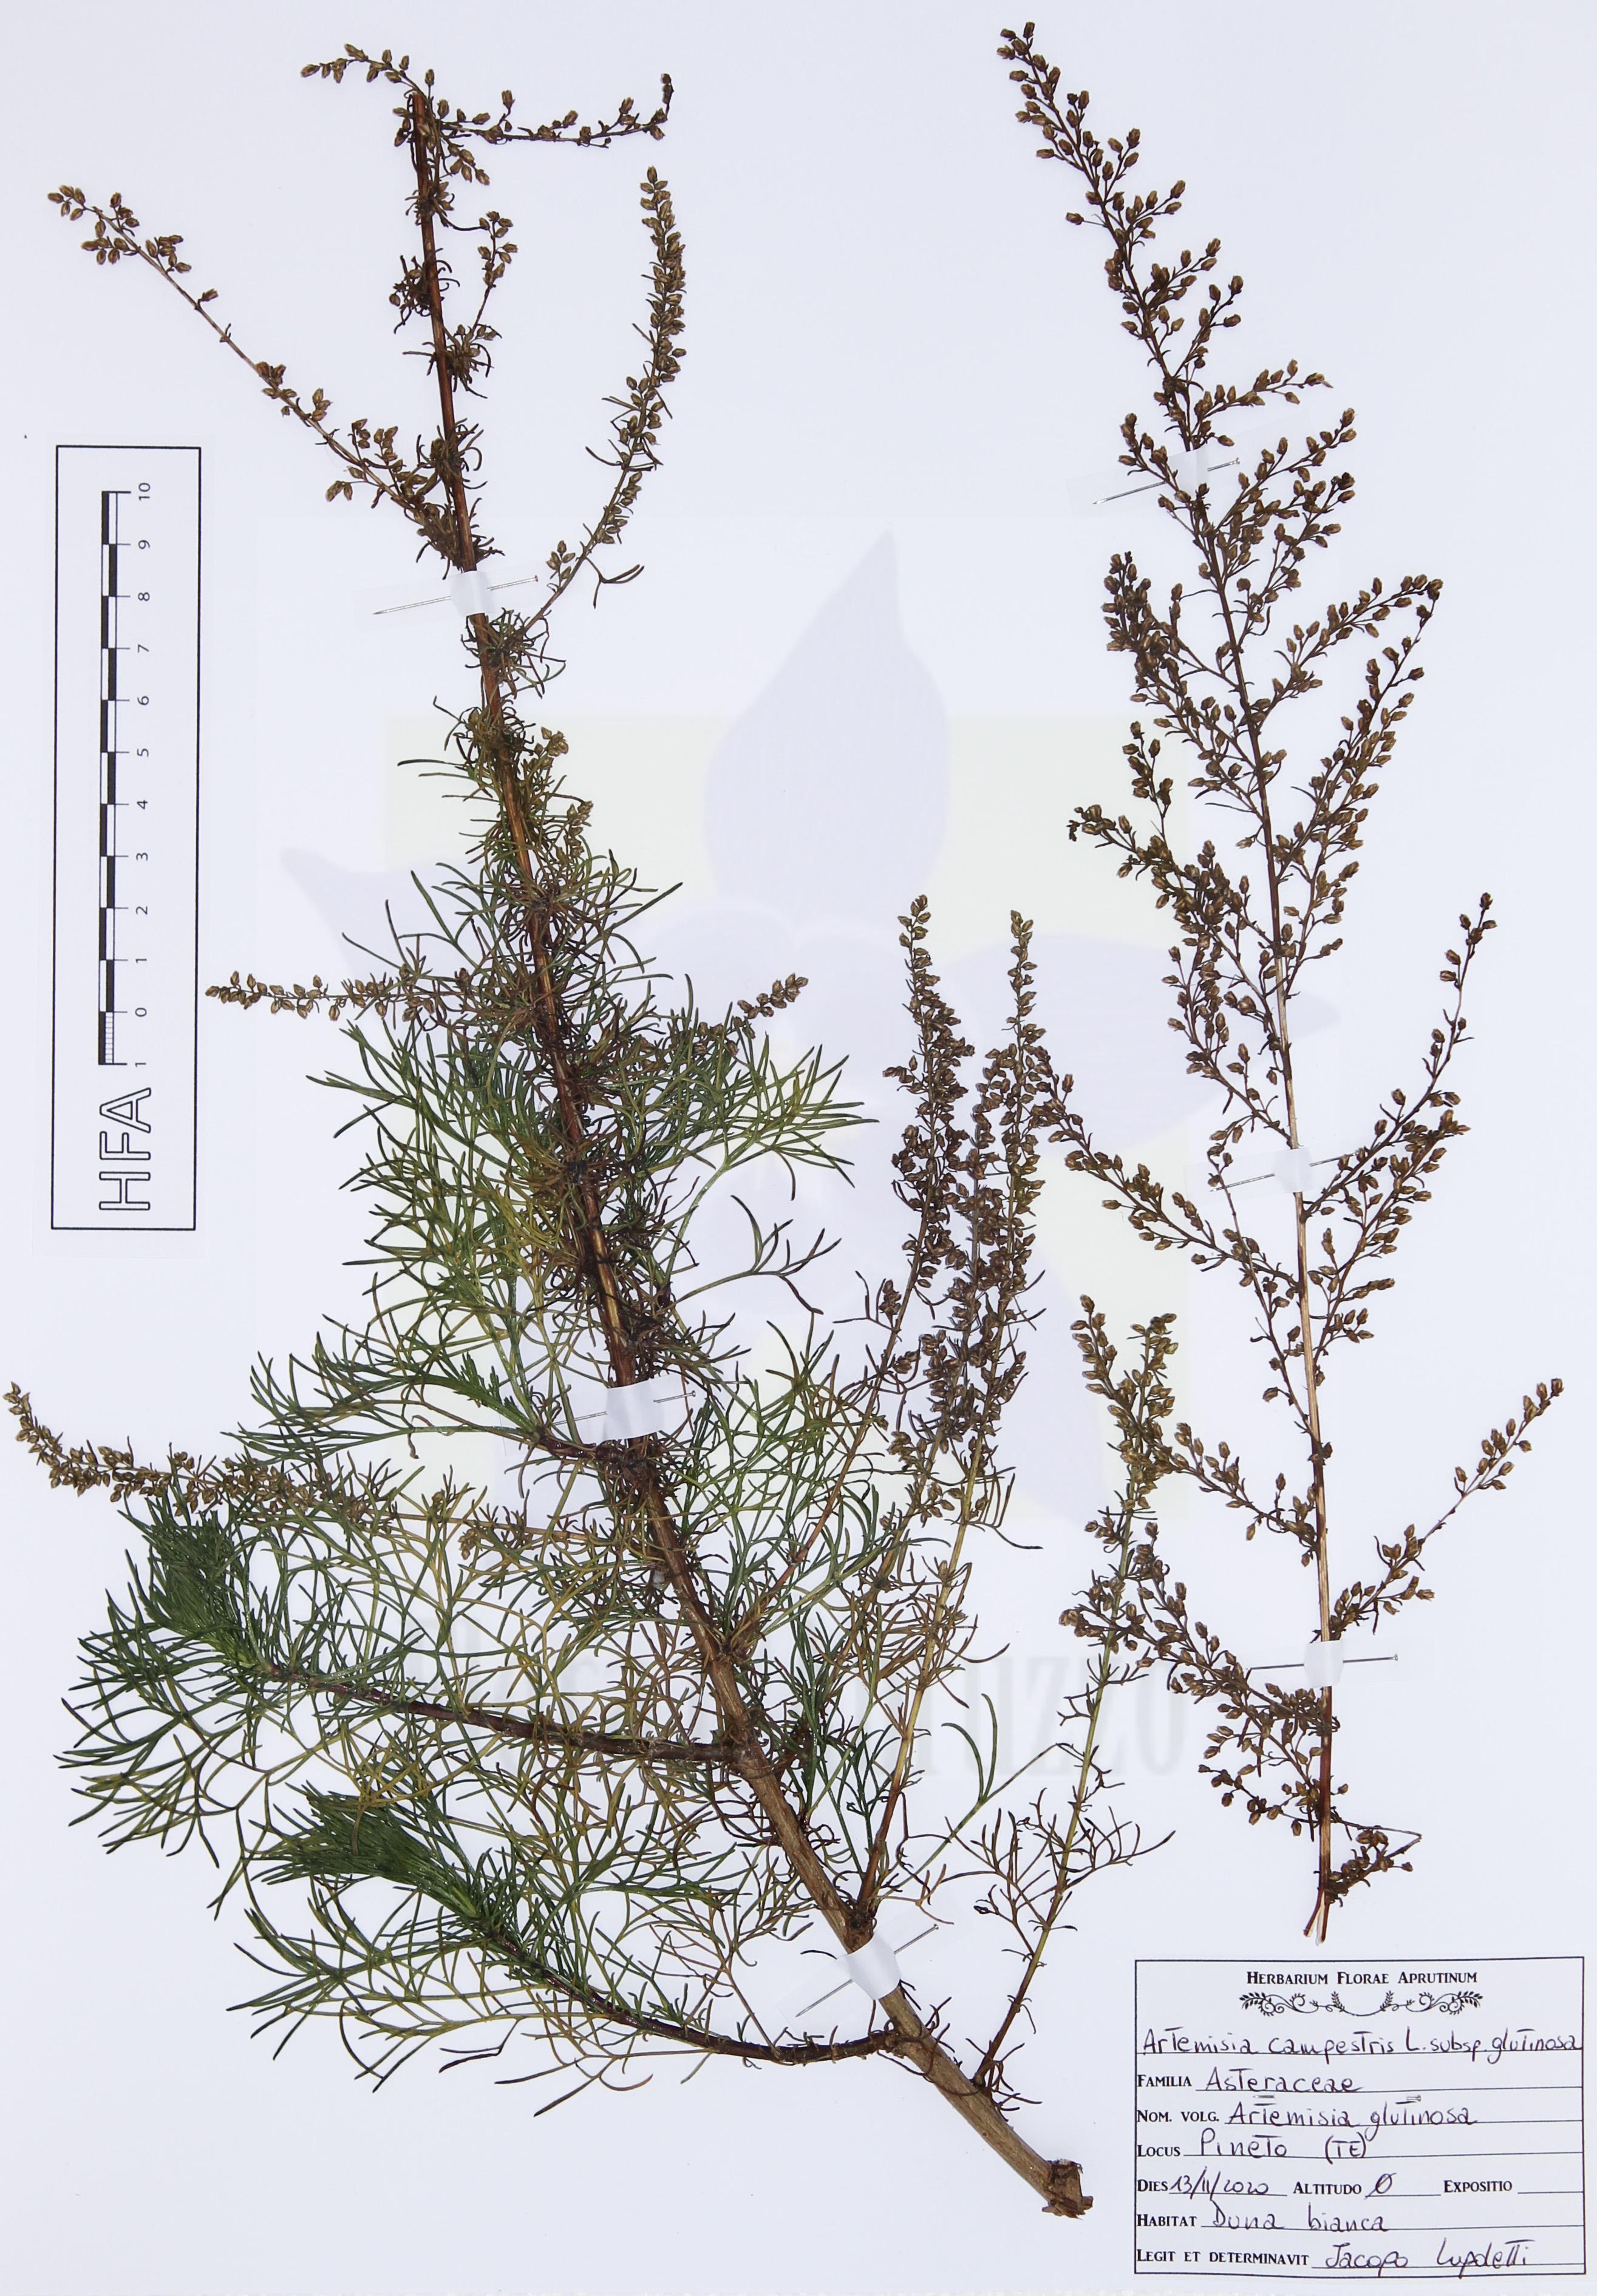 Artemisia campestris L. subsp. glutinosa (J.Gay ex Besser) Batt.